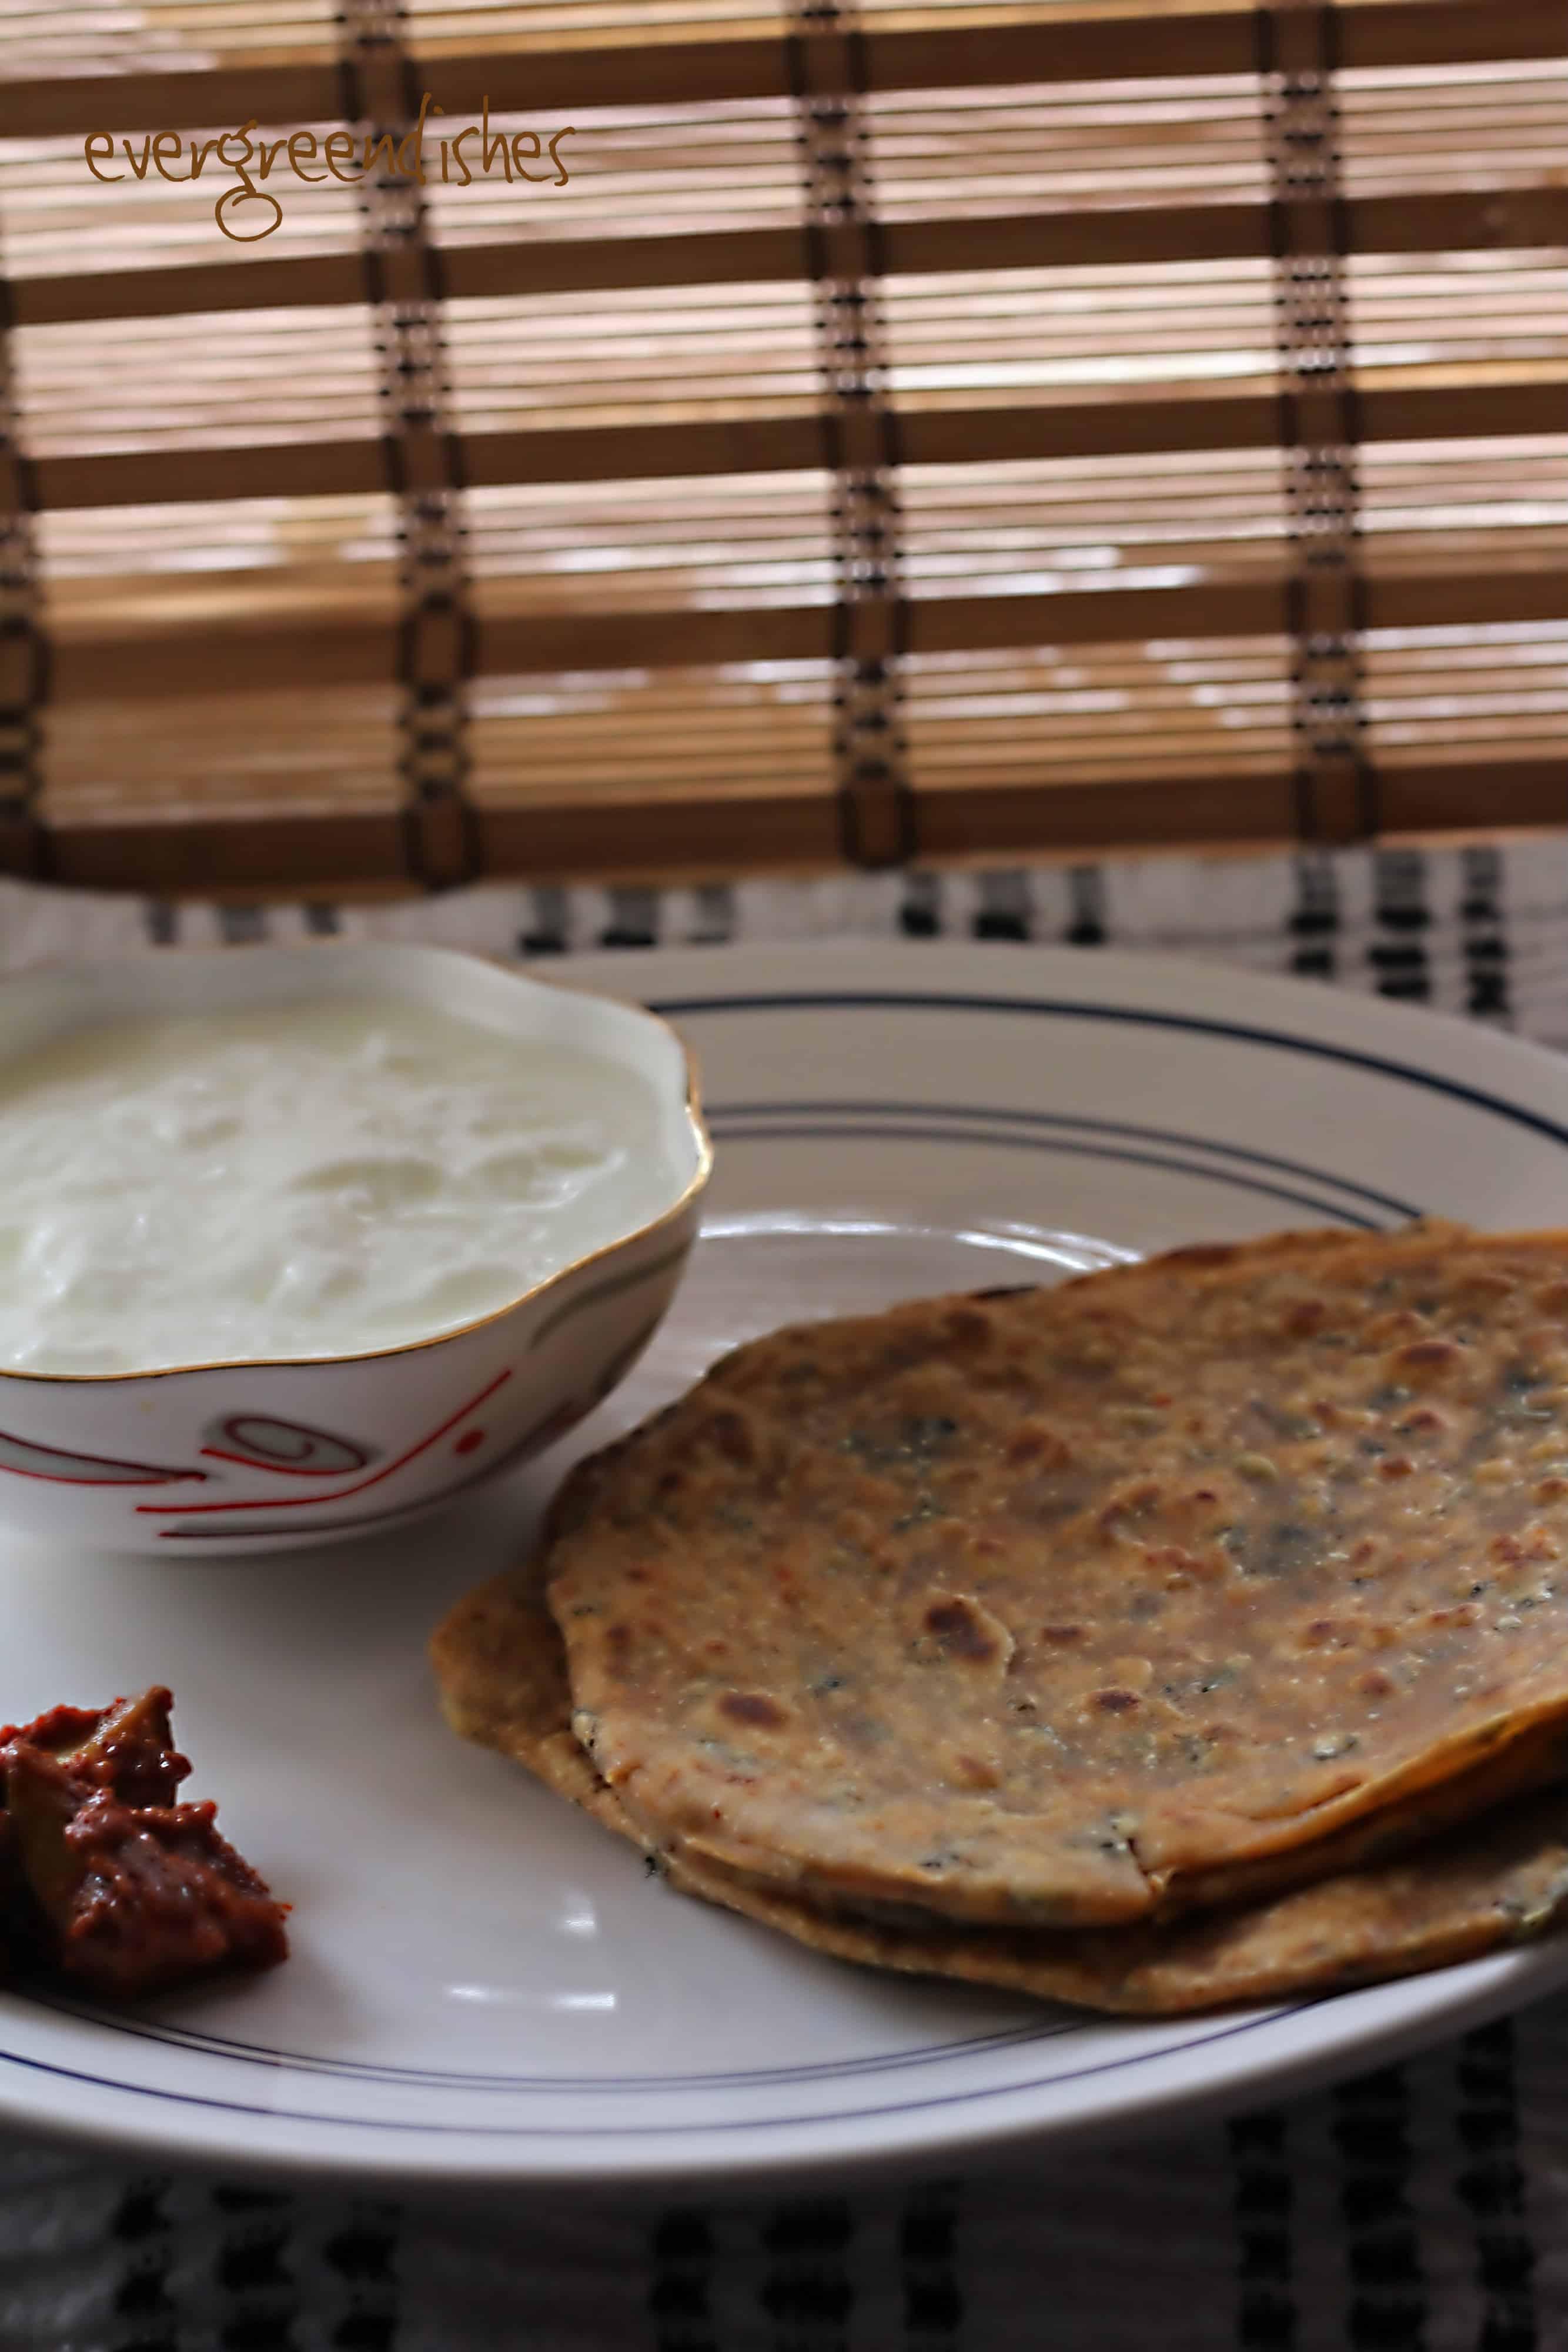 mint paratha mint paratha, pudina paratha Mint paratha, pudina paratha in steps mint paratha10